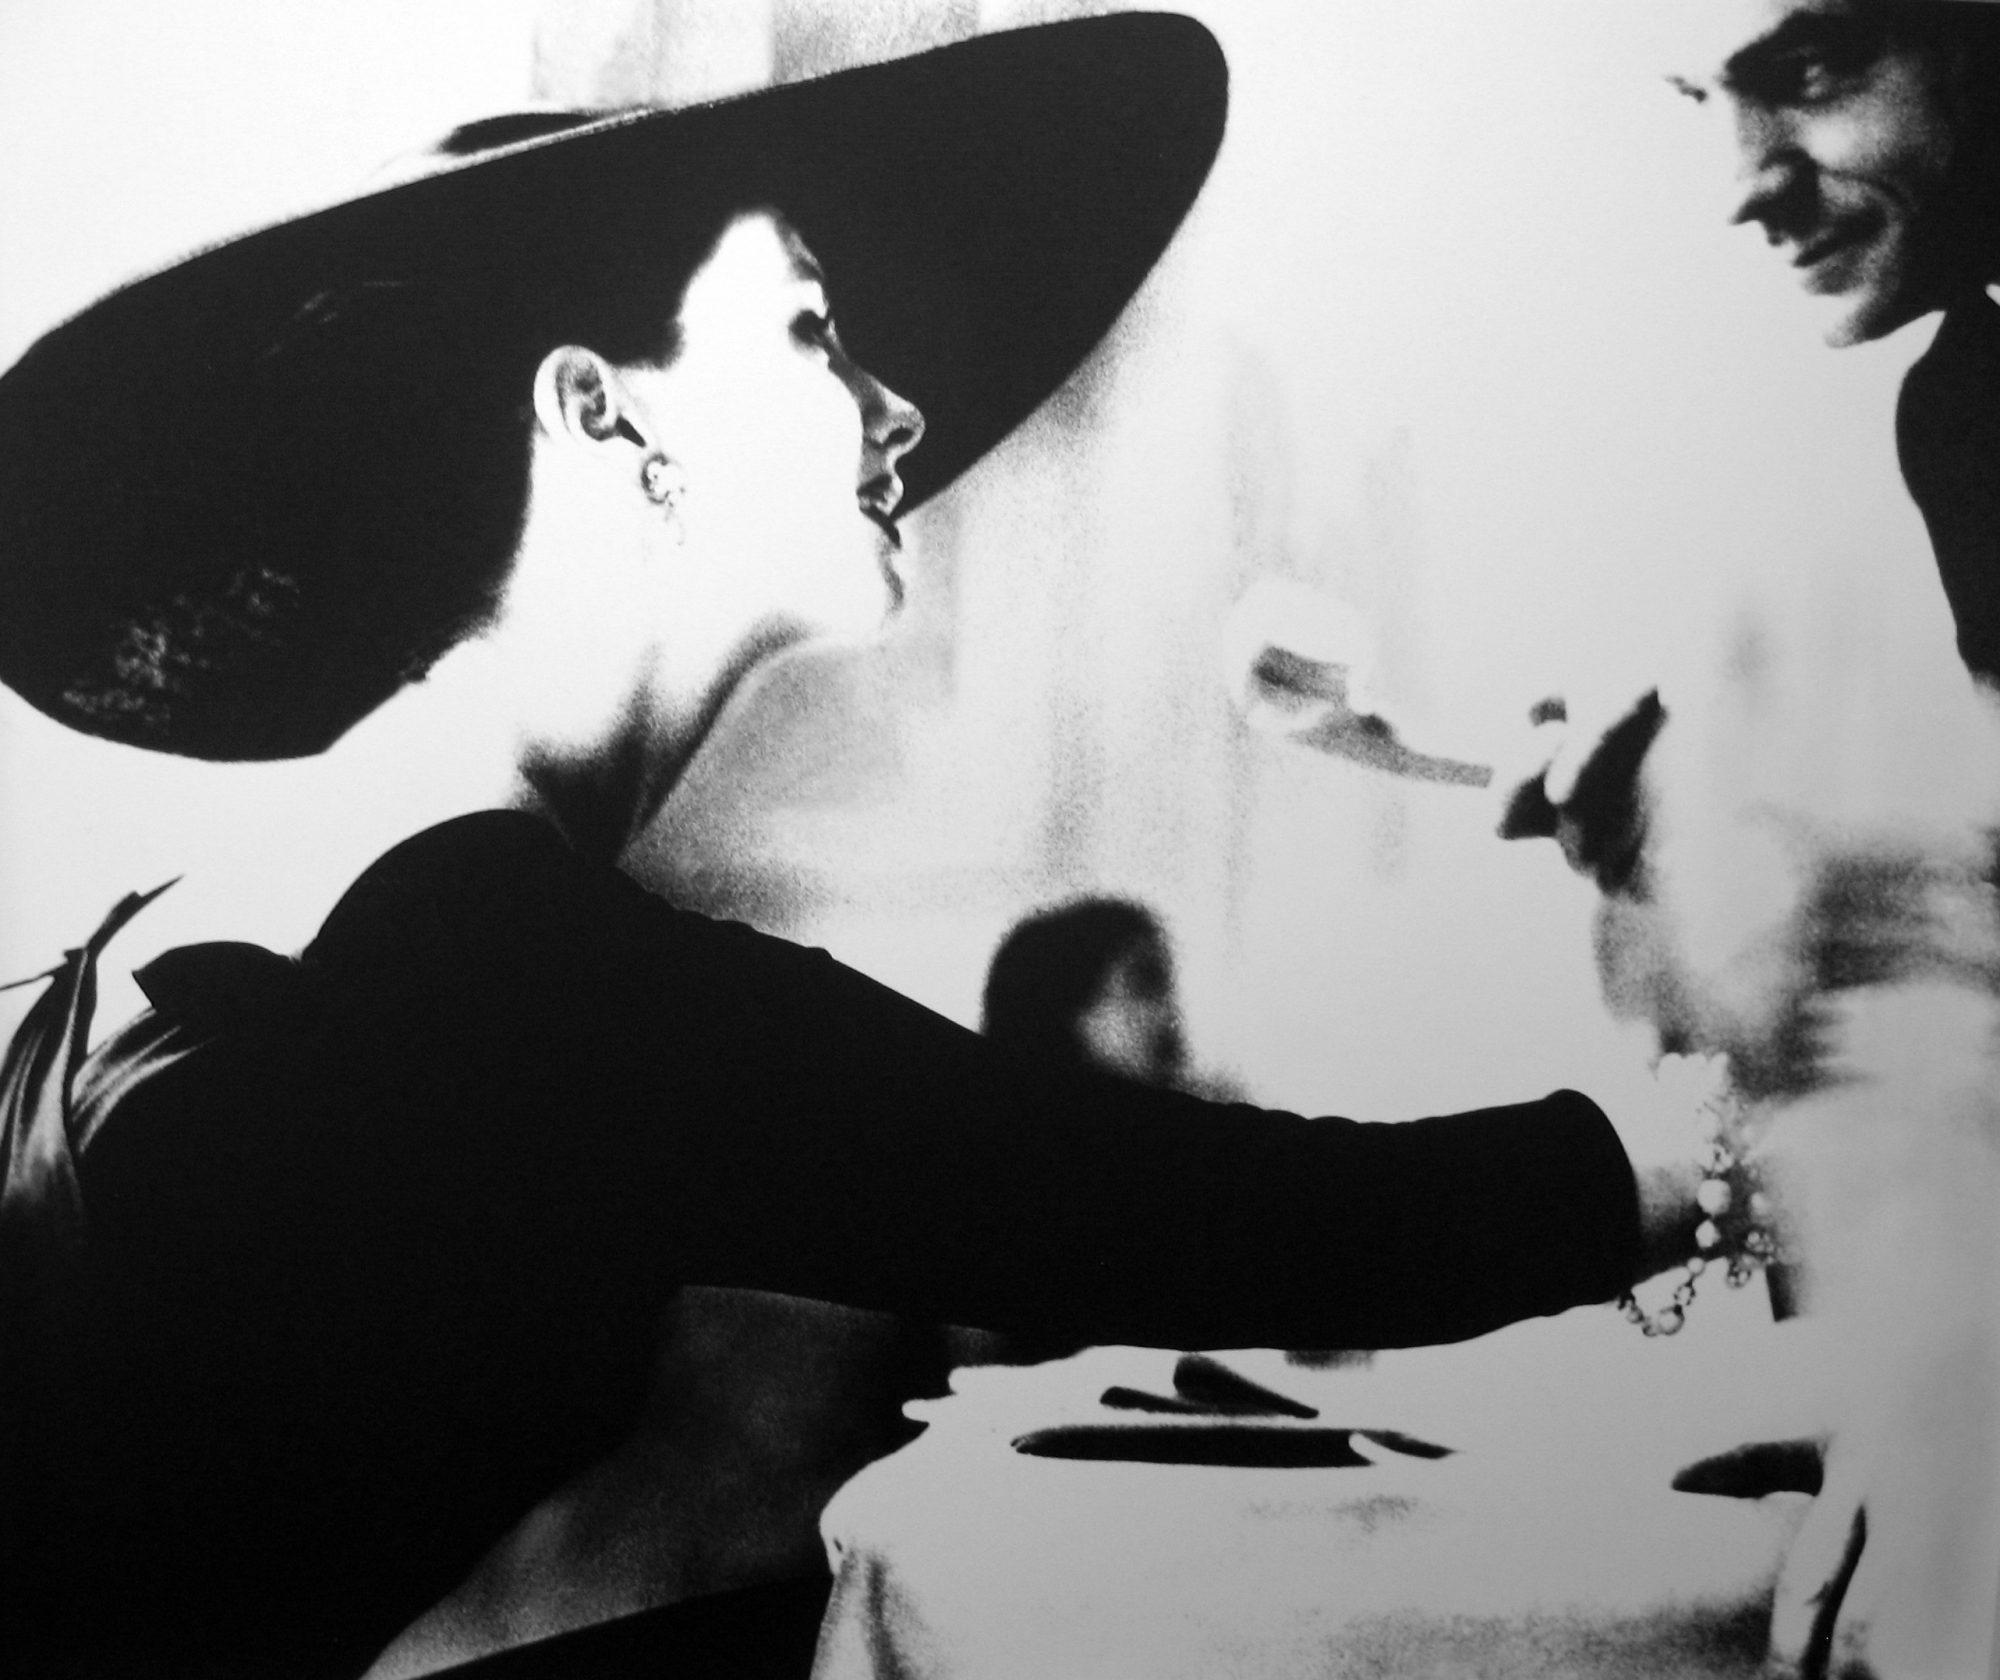 Fotó: Lillian Bassman:  'The V-Back Evenings', Dress by Trigere, Suzy Parker, New York, Harper's Bazaar, July 1955